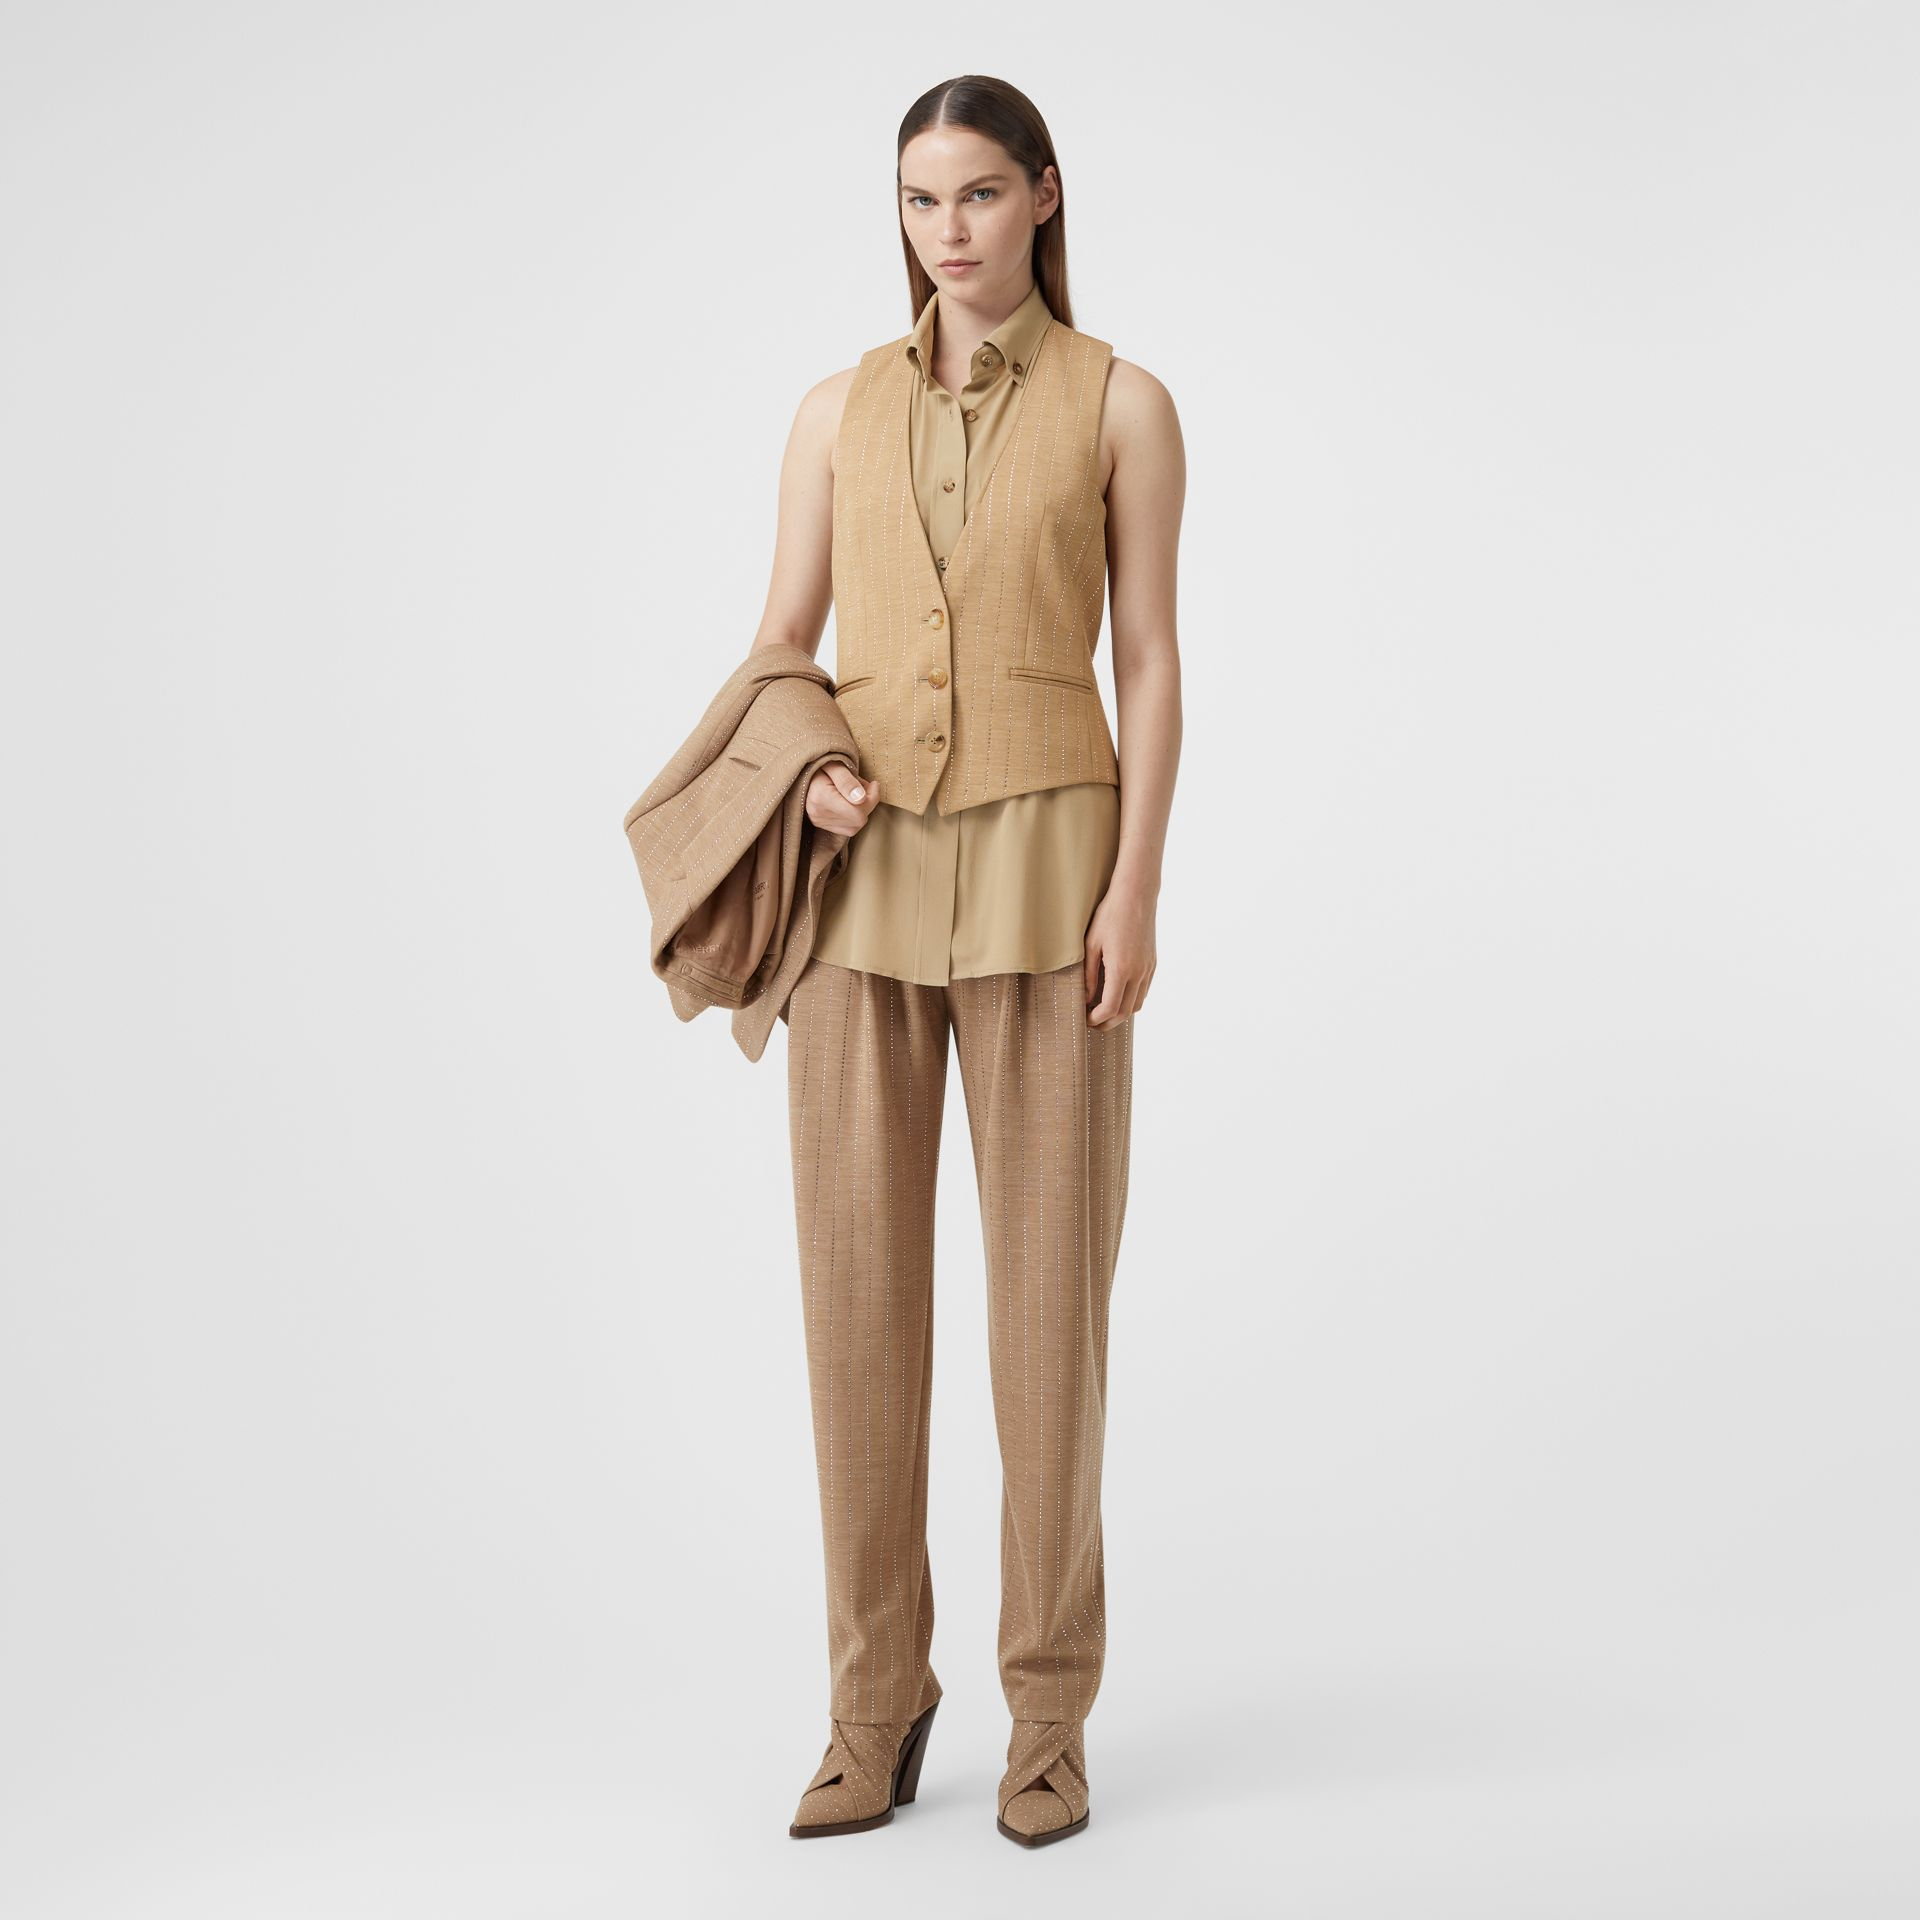 Shirt Detail Crystal Pinstriped Wool Blend Waistcoat in Pecan Melange - Women | Burberry - gallery image 0